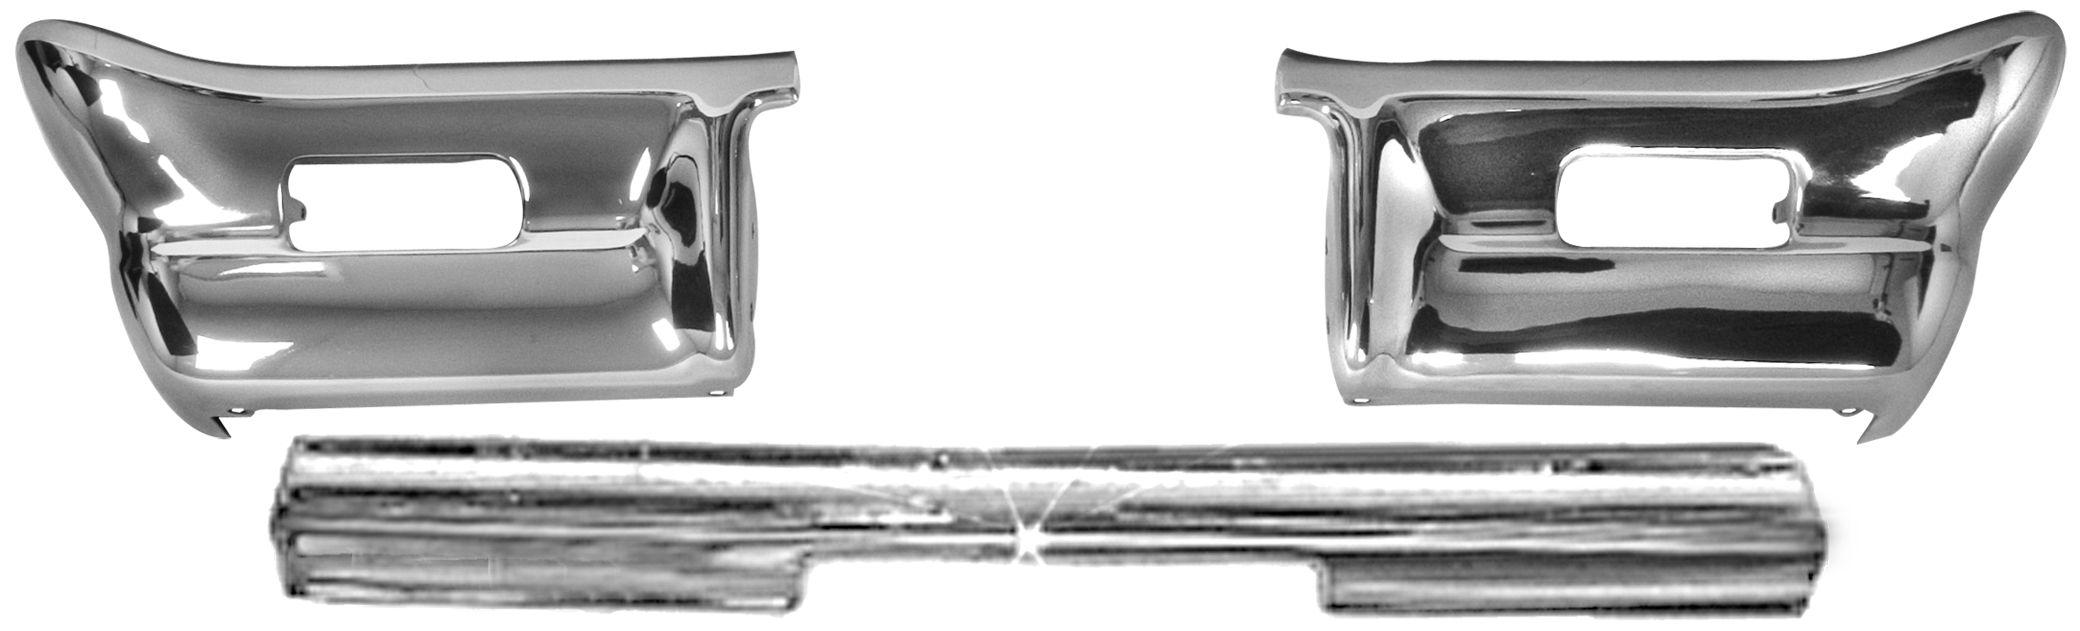 1964 Impala front bumper chrome